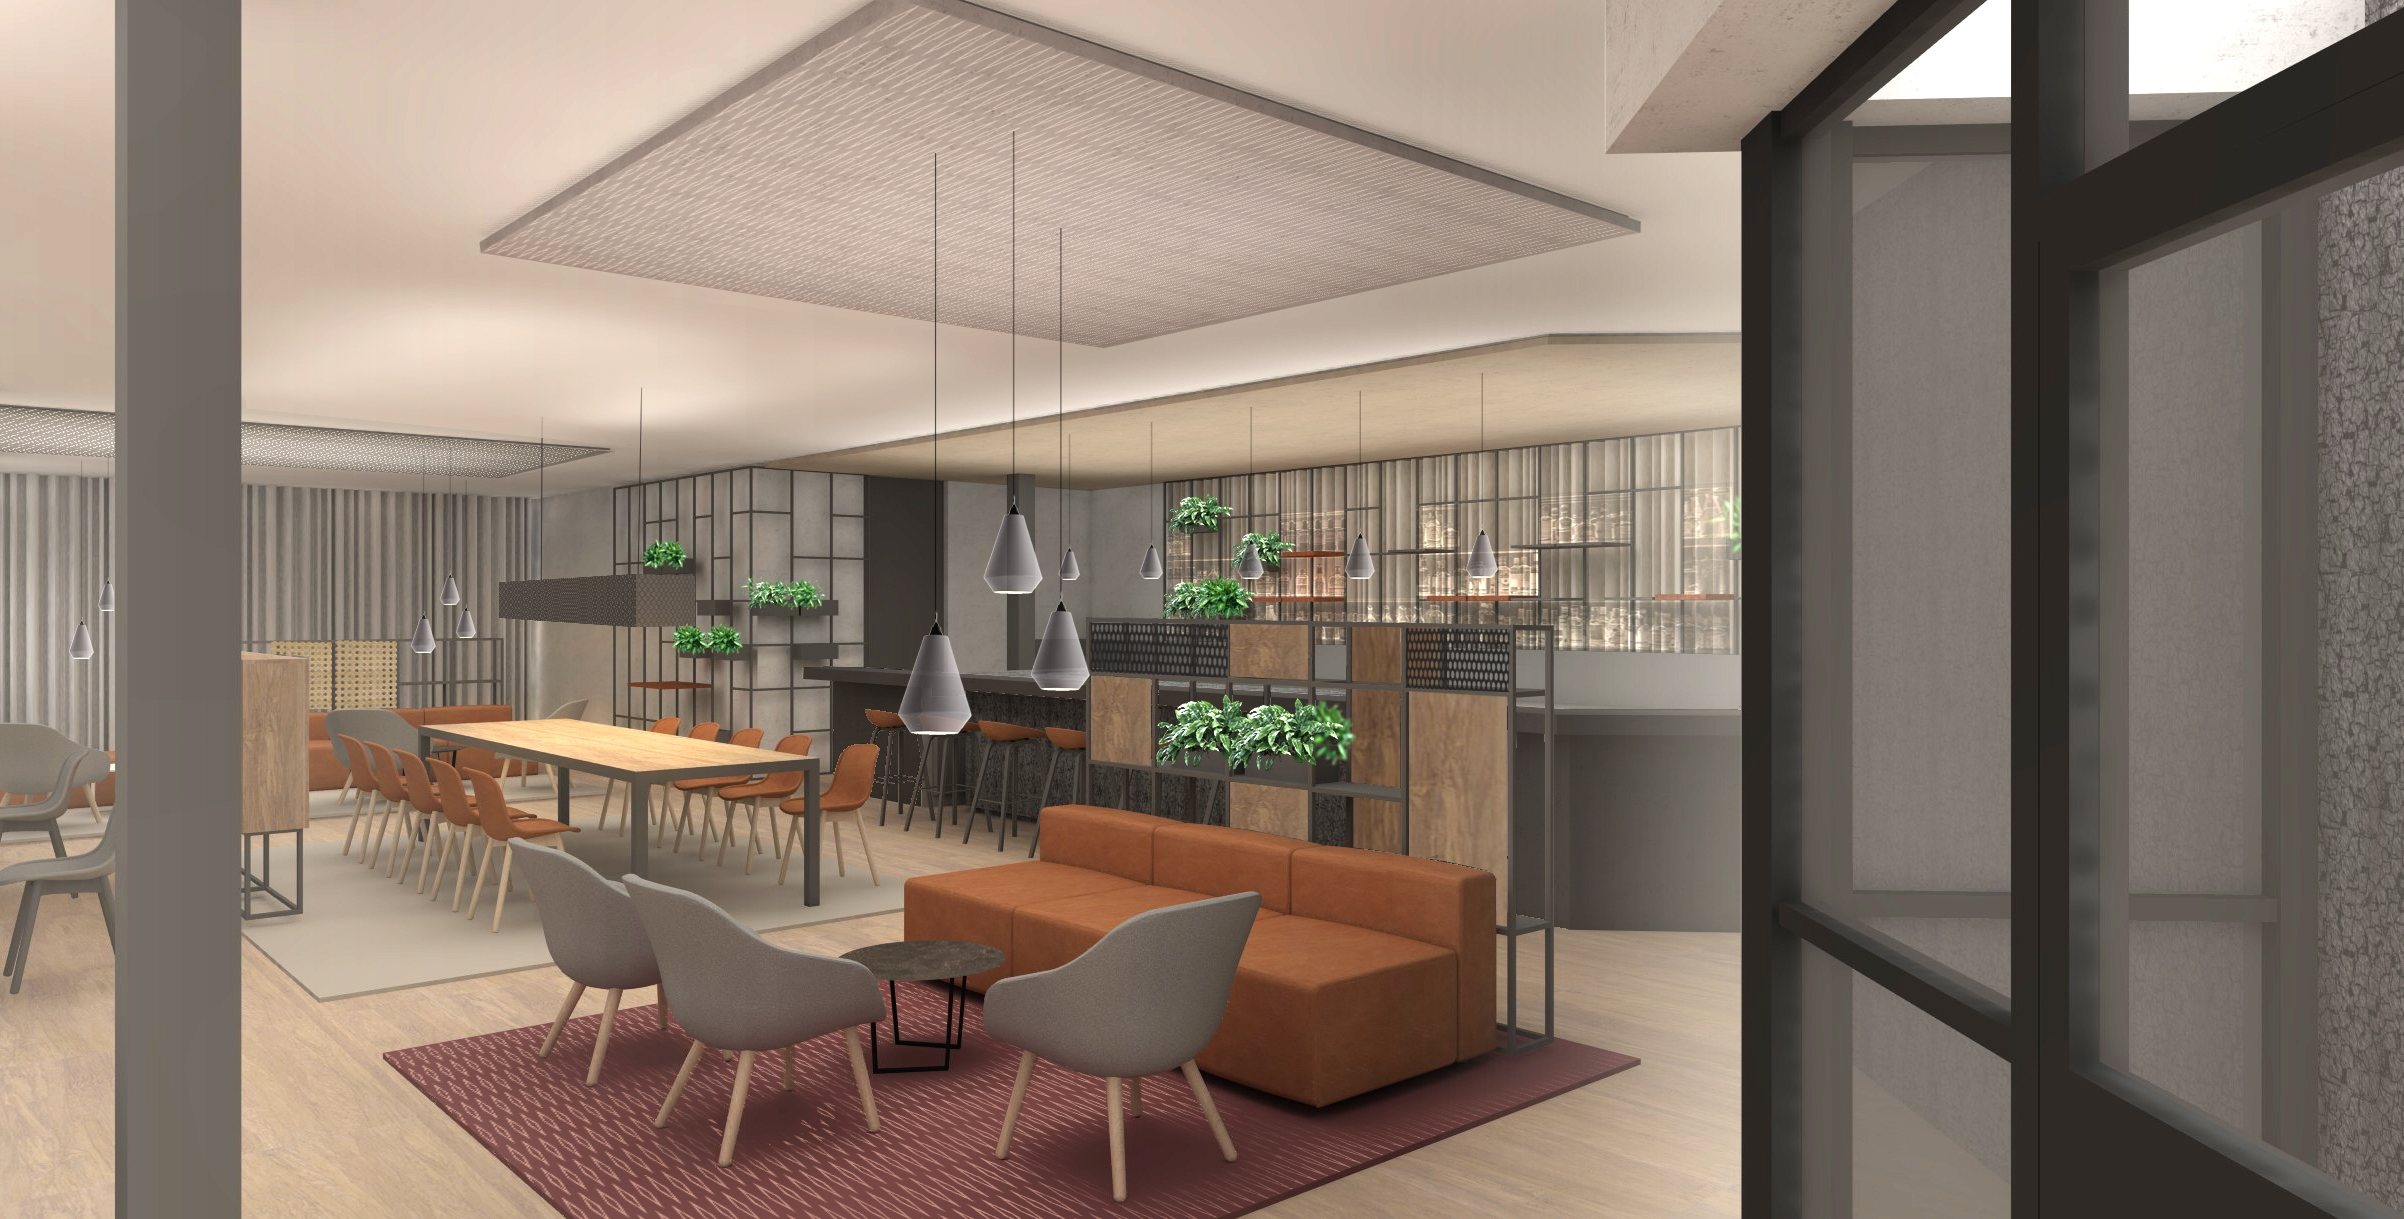 Mecc maastricht cafe 3d design